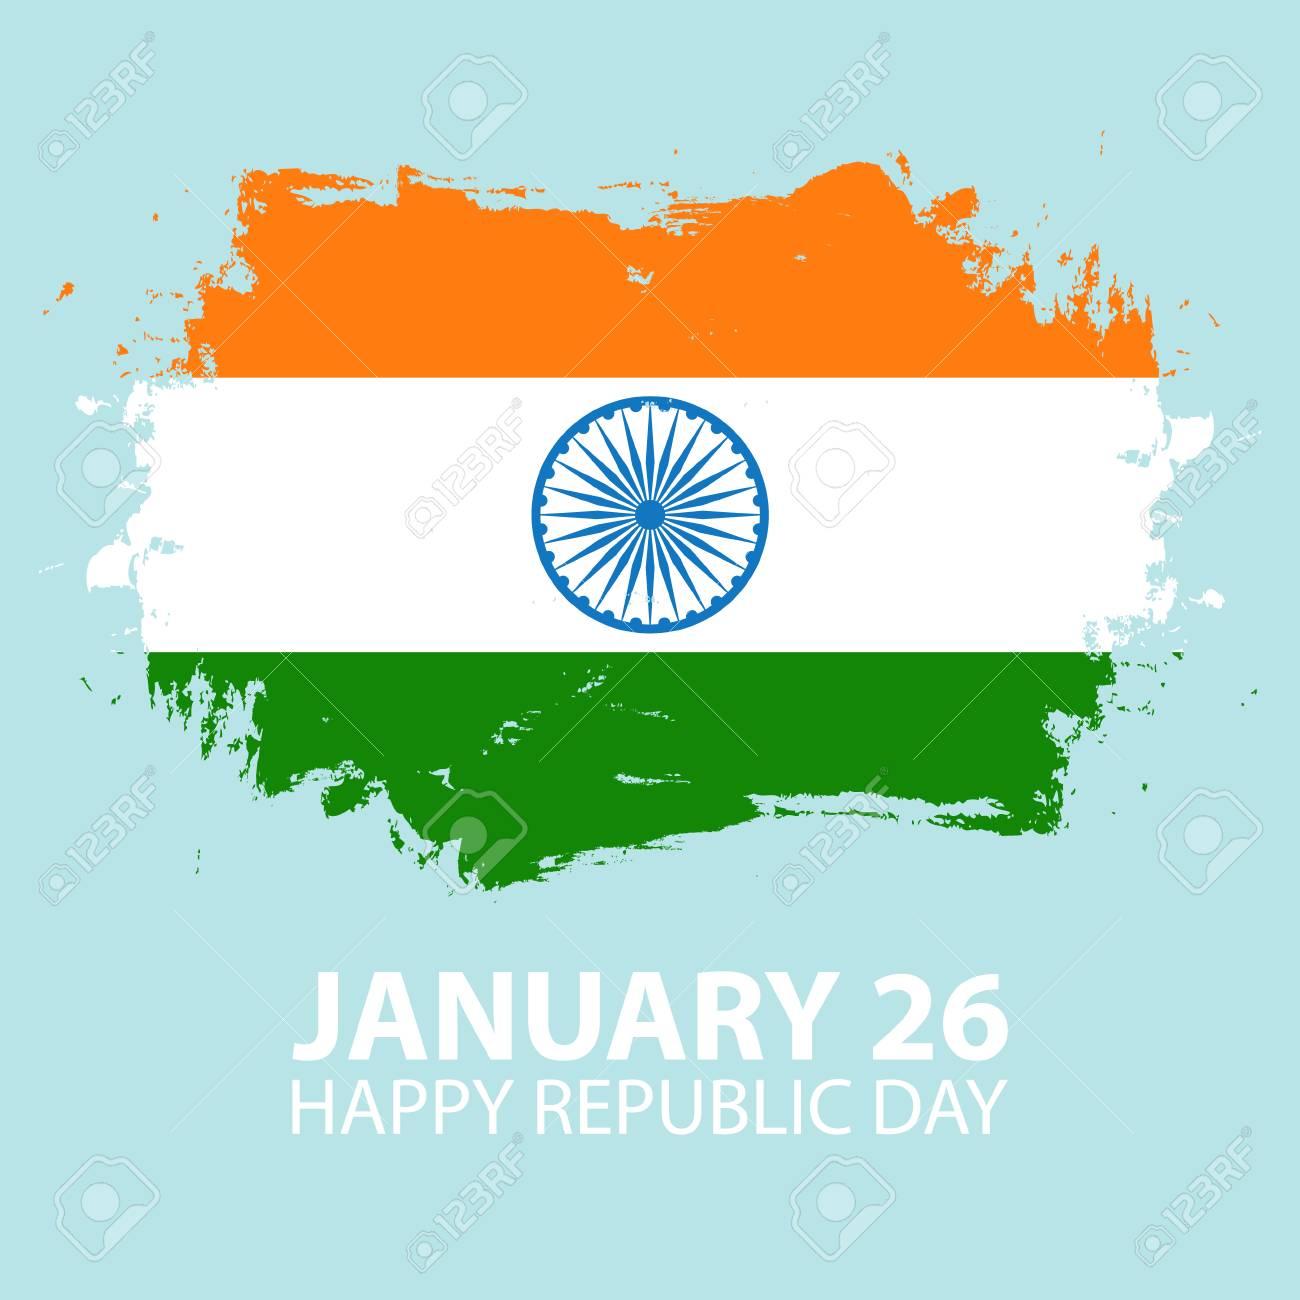 India happy republic day january 26 greeting card with brush india happy republic day january 26 greeting card with brush stroke in colors of the m4hsunfo